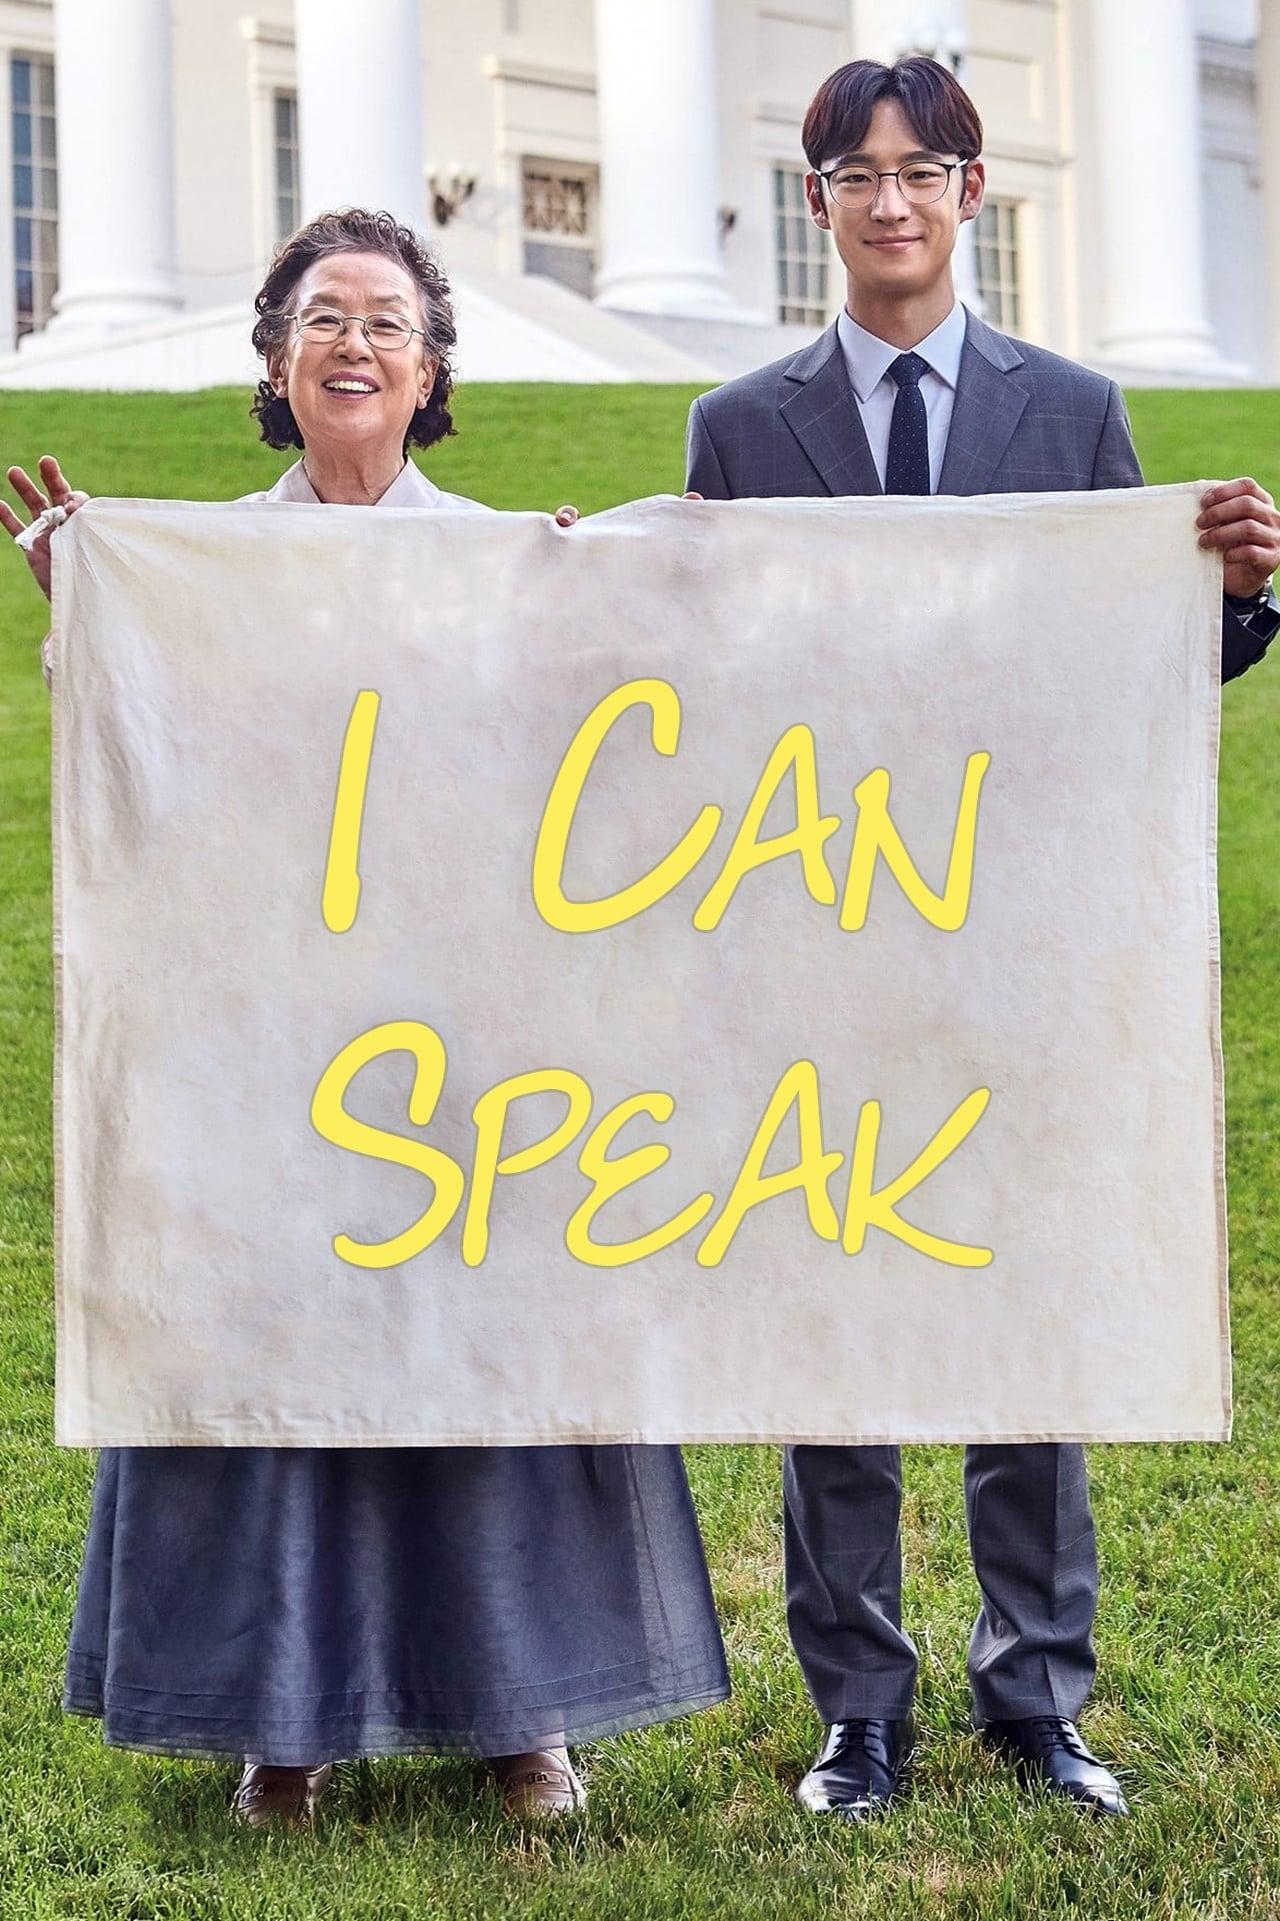 I Can Speak